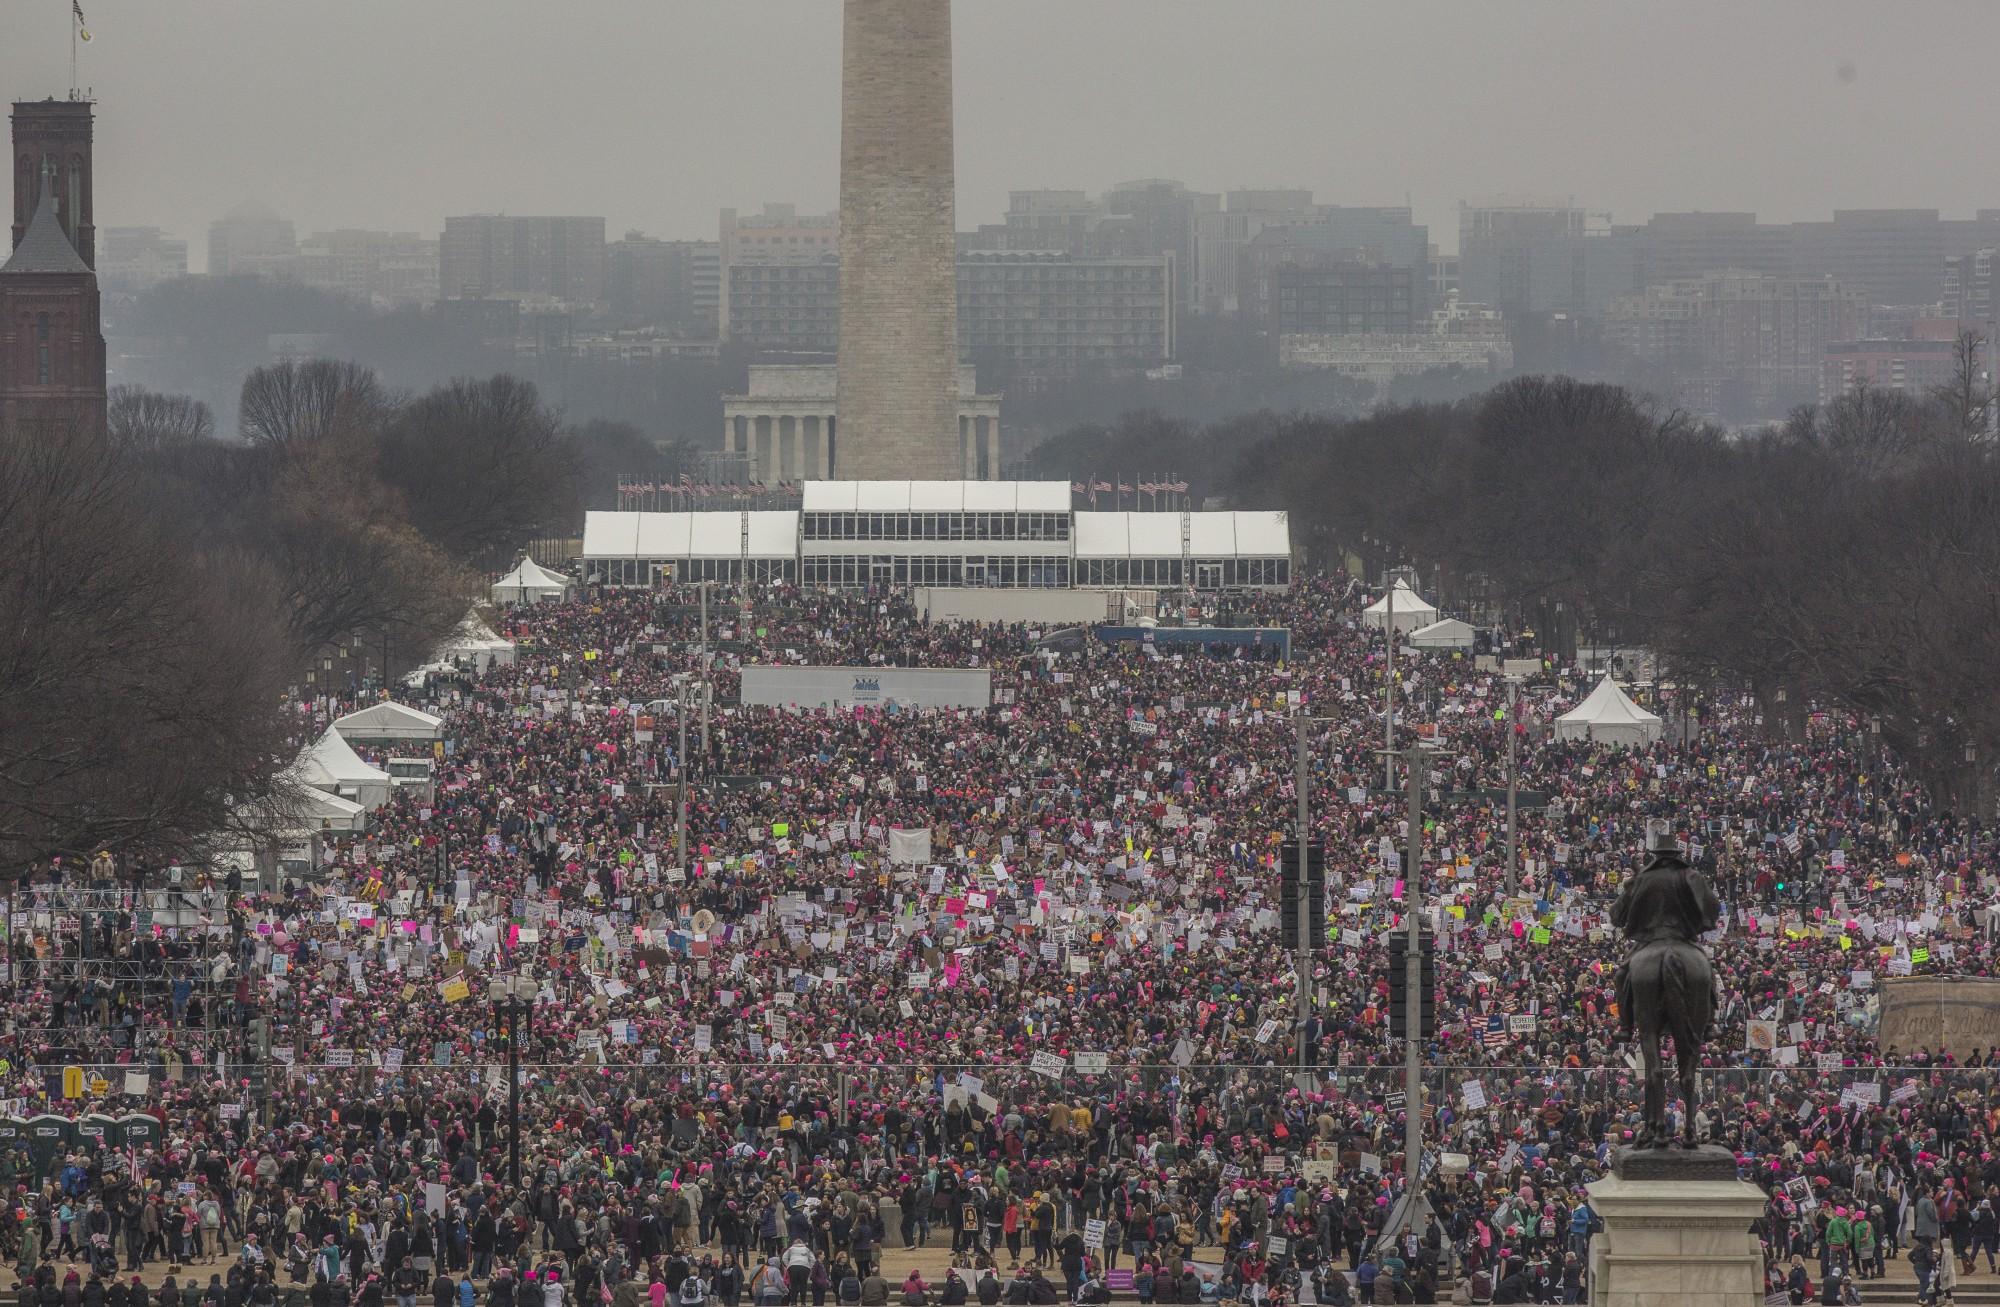 Evelyn Hockstein / The Washington Post